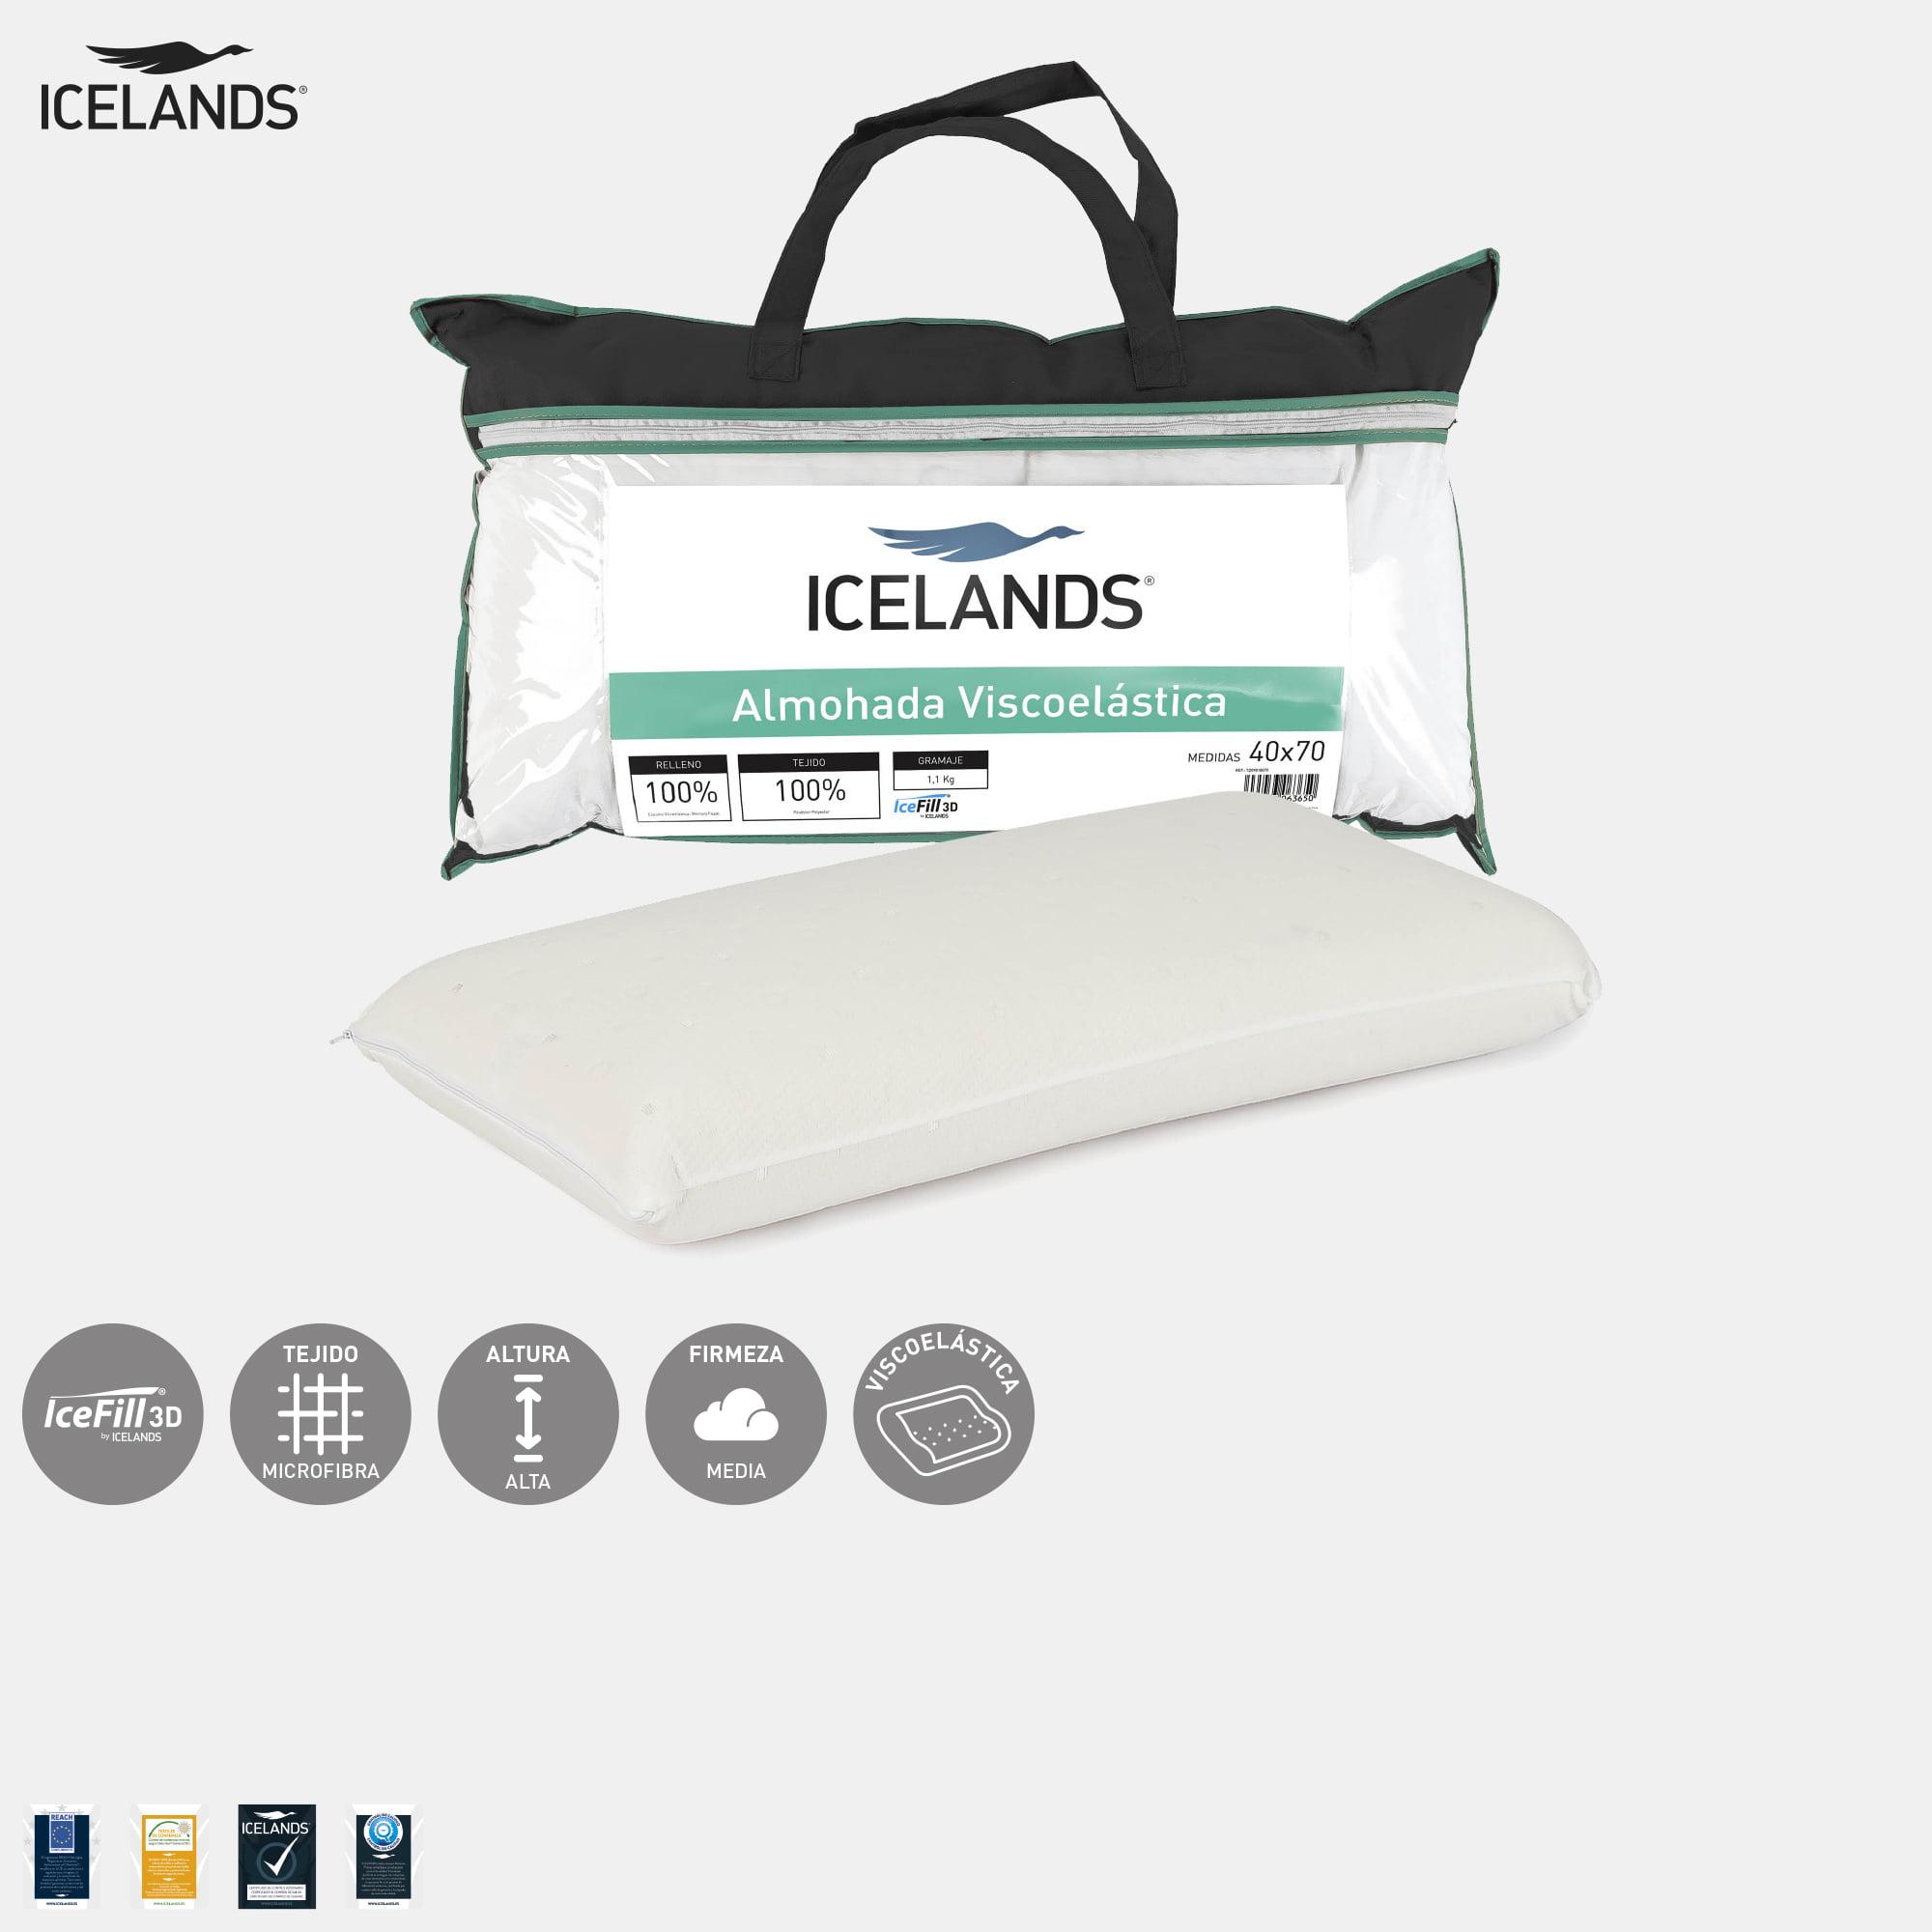 Almohada Viscoelástica Icelands